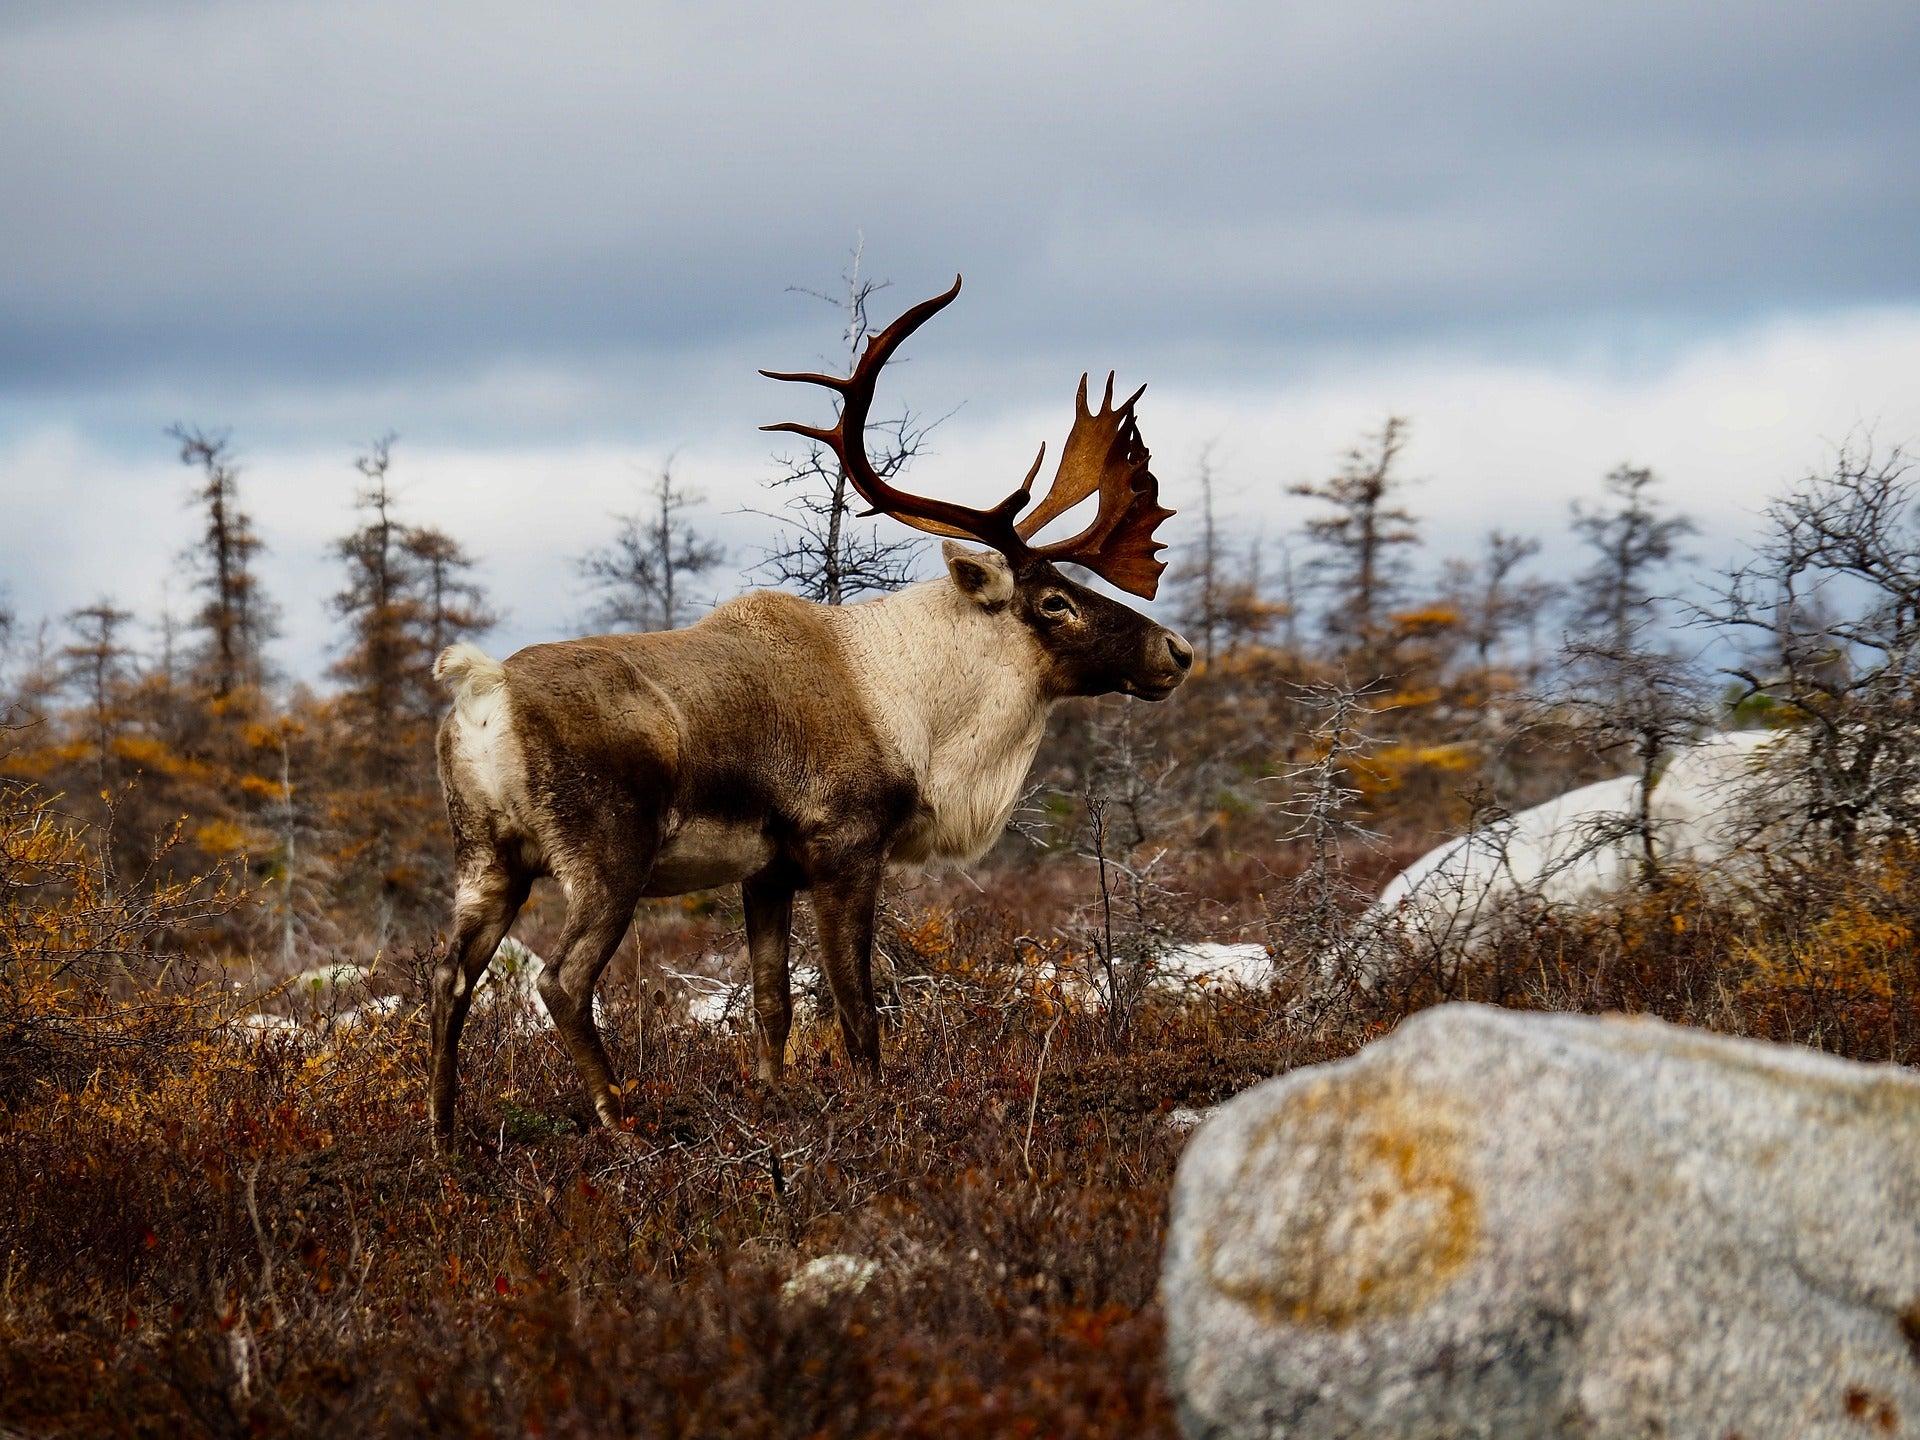 Alaska Opens Hunting Permit Raffle to Combat COVID-19 Travel-Related Revenue Shortfall